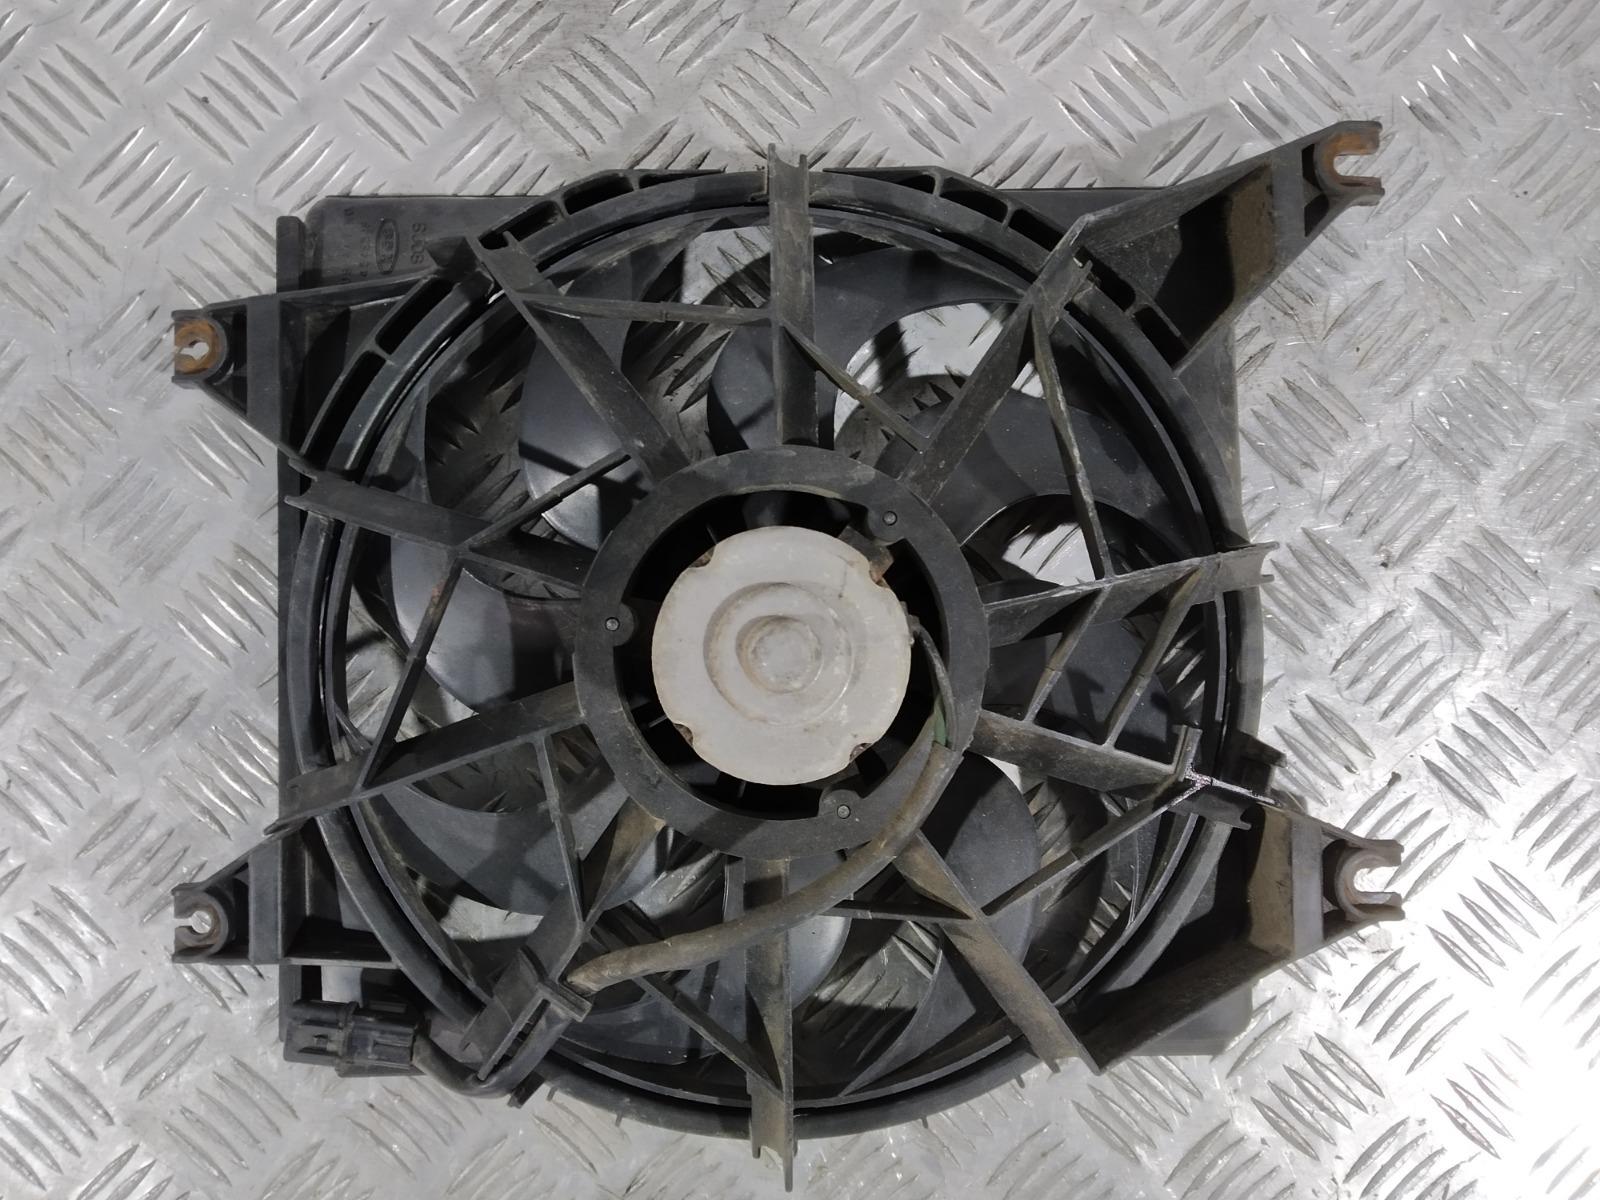 Вентилятор радиатора Hyundai Accent X3 1.5 I 1999 (б/у)